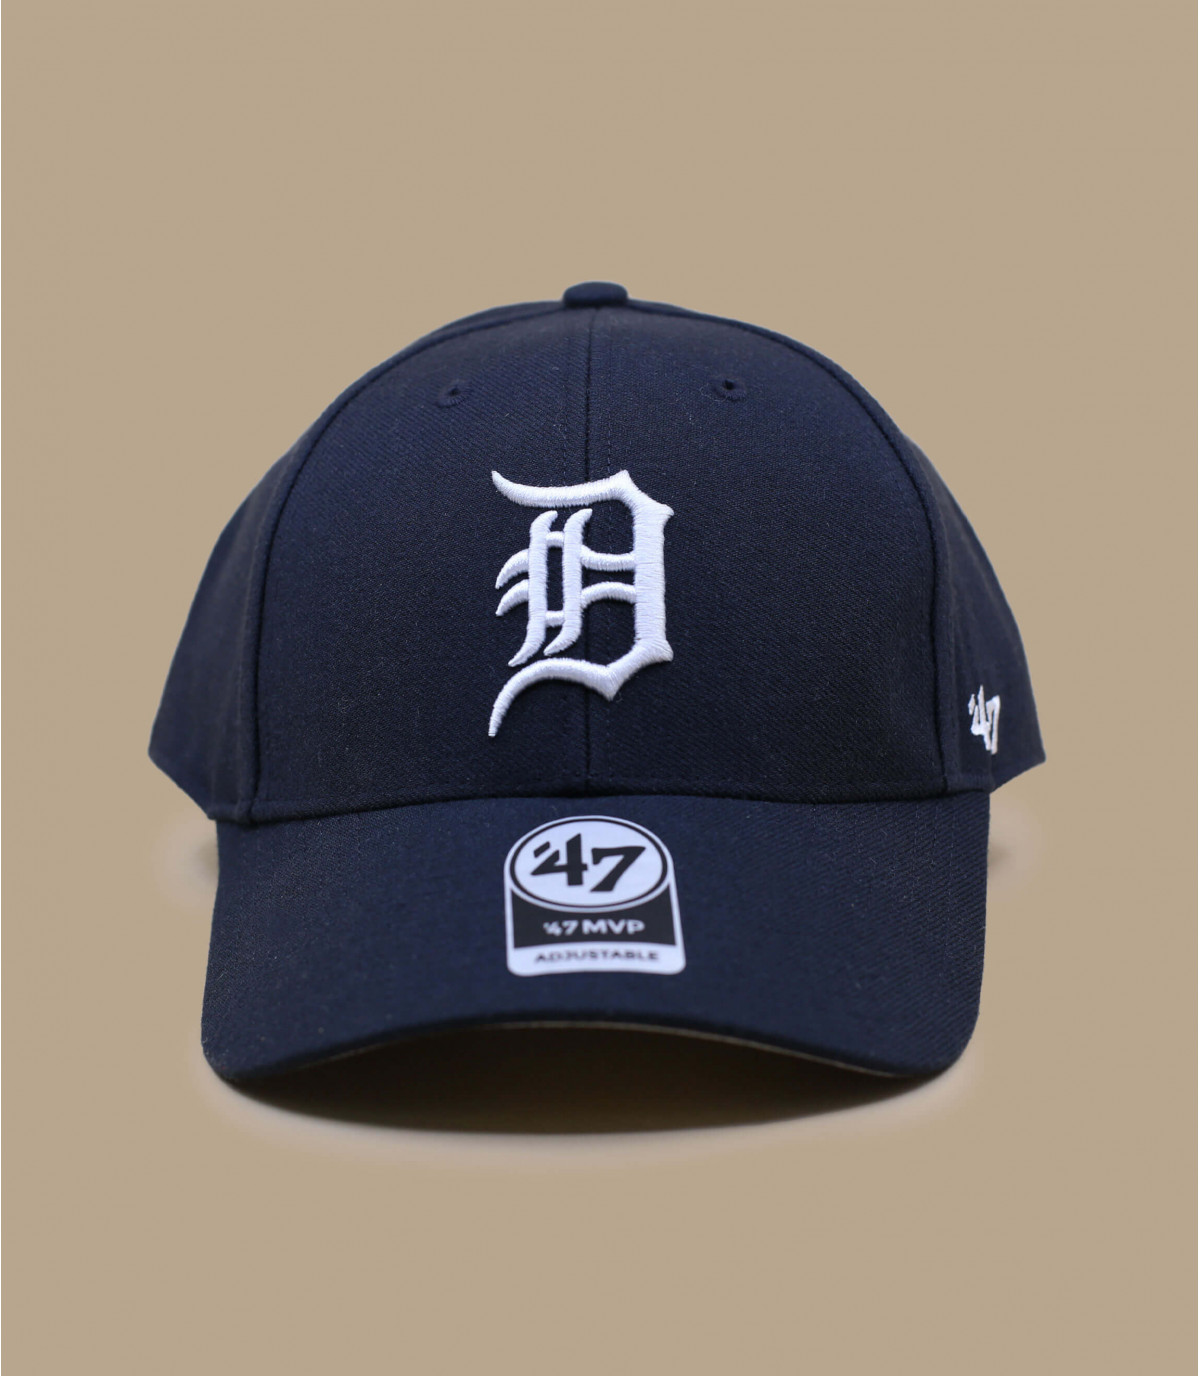 D navy blue curve cap